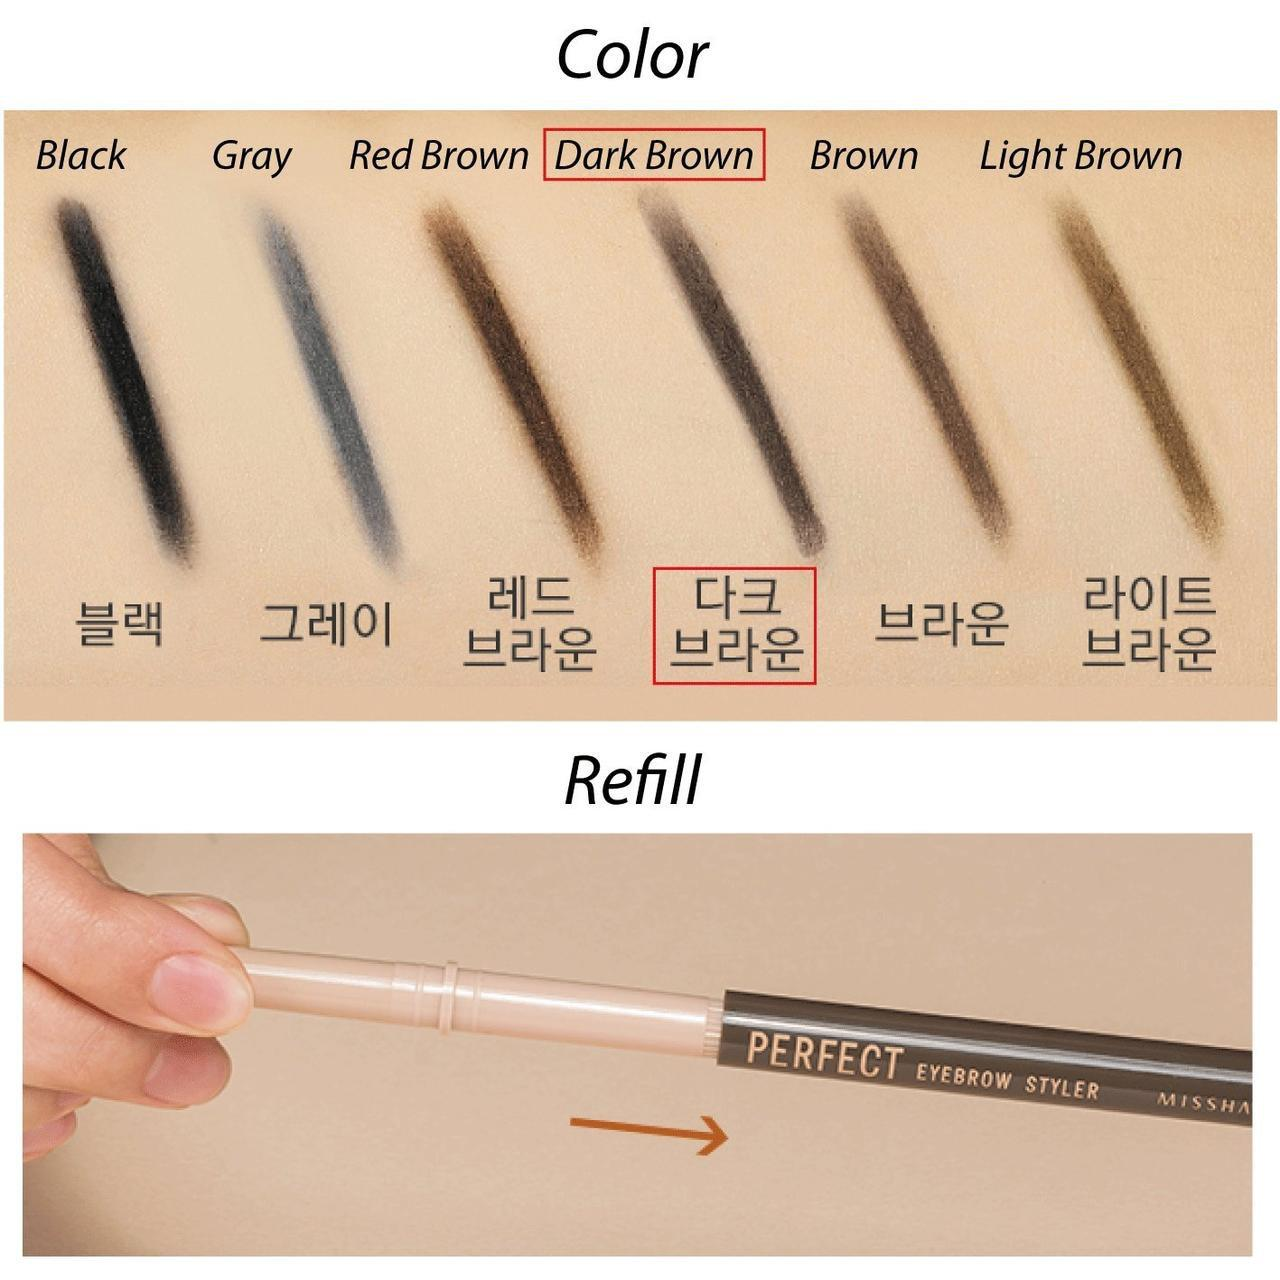 Сменный блок для автоматического карандаша для бровей Missha The Style Perfect Eyebrow Styler - Red Brown 0,35 (8806185750059)